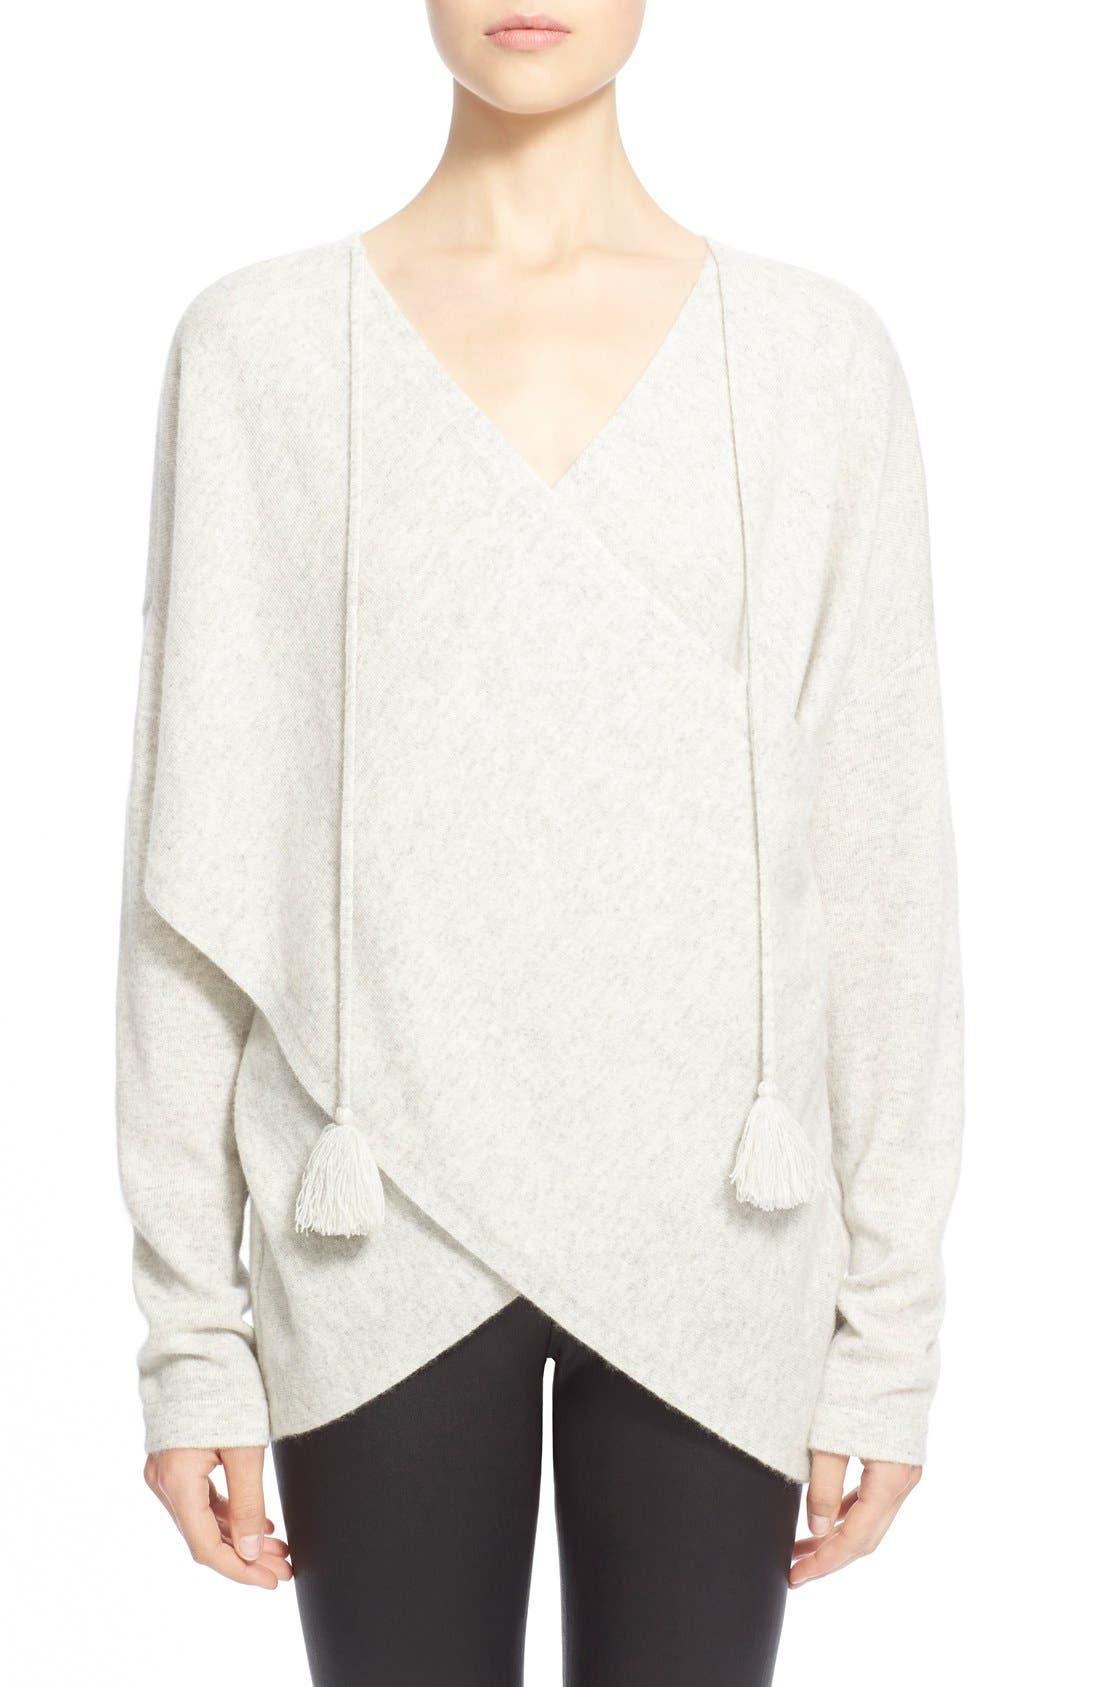 Main Image - Derek Lam 10 Crosby Tasseled Cross Front Cashmere Sweater